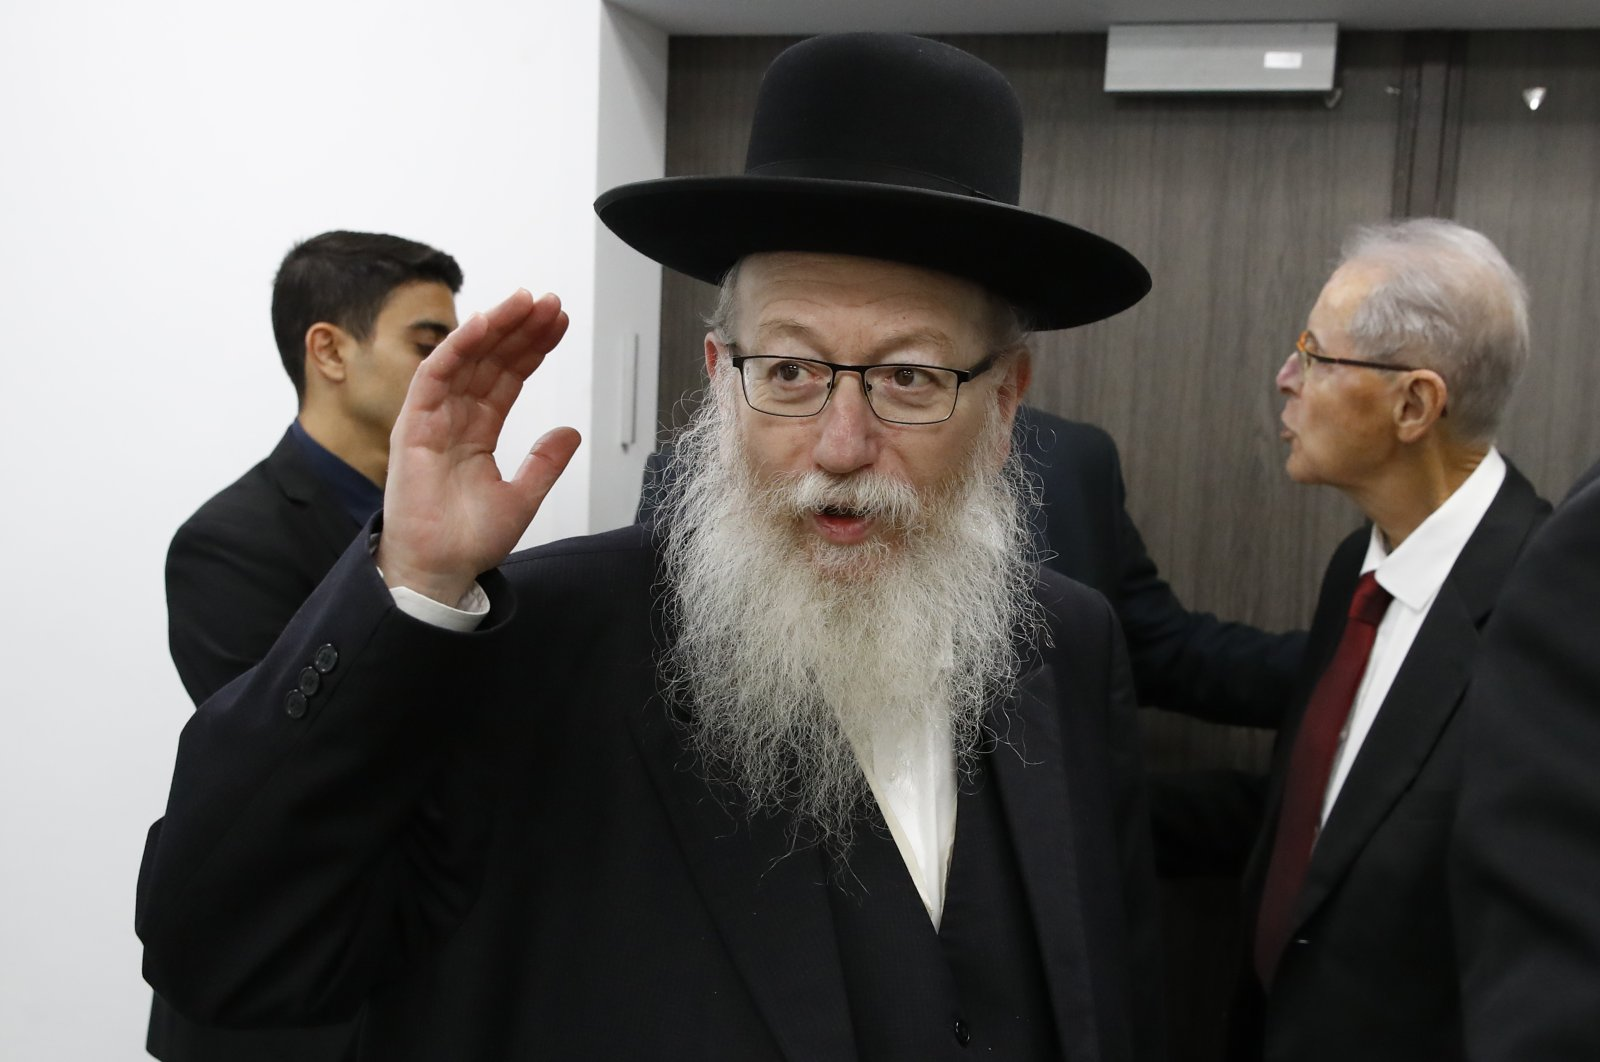 Israeli Health Minister Yaakov Litzman arrives for a situation assessment meeting with Prime Minister Benjamin Netanyahu and others regarding the coronavirus, Tel Aviv, Feb. 23, 2020. (AP Photo)